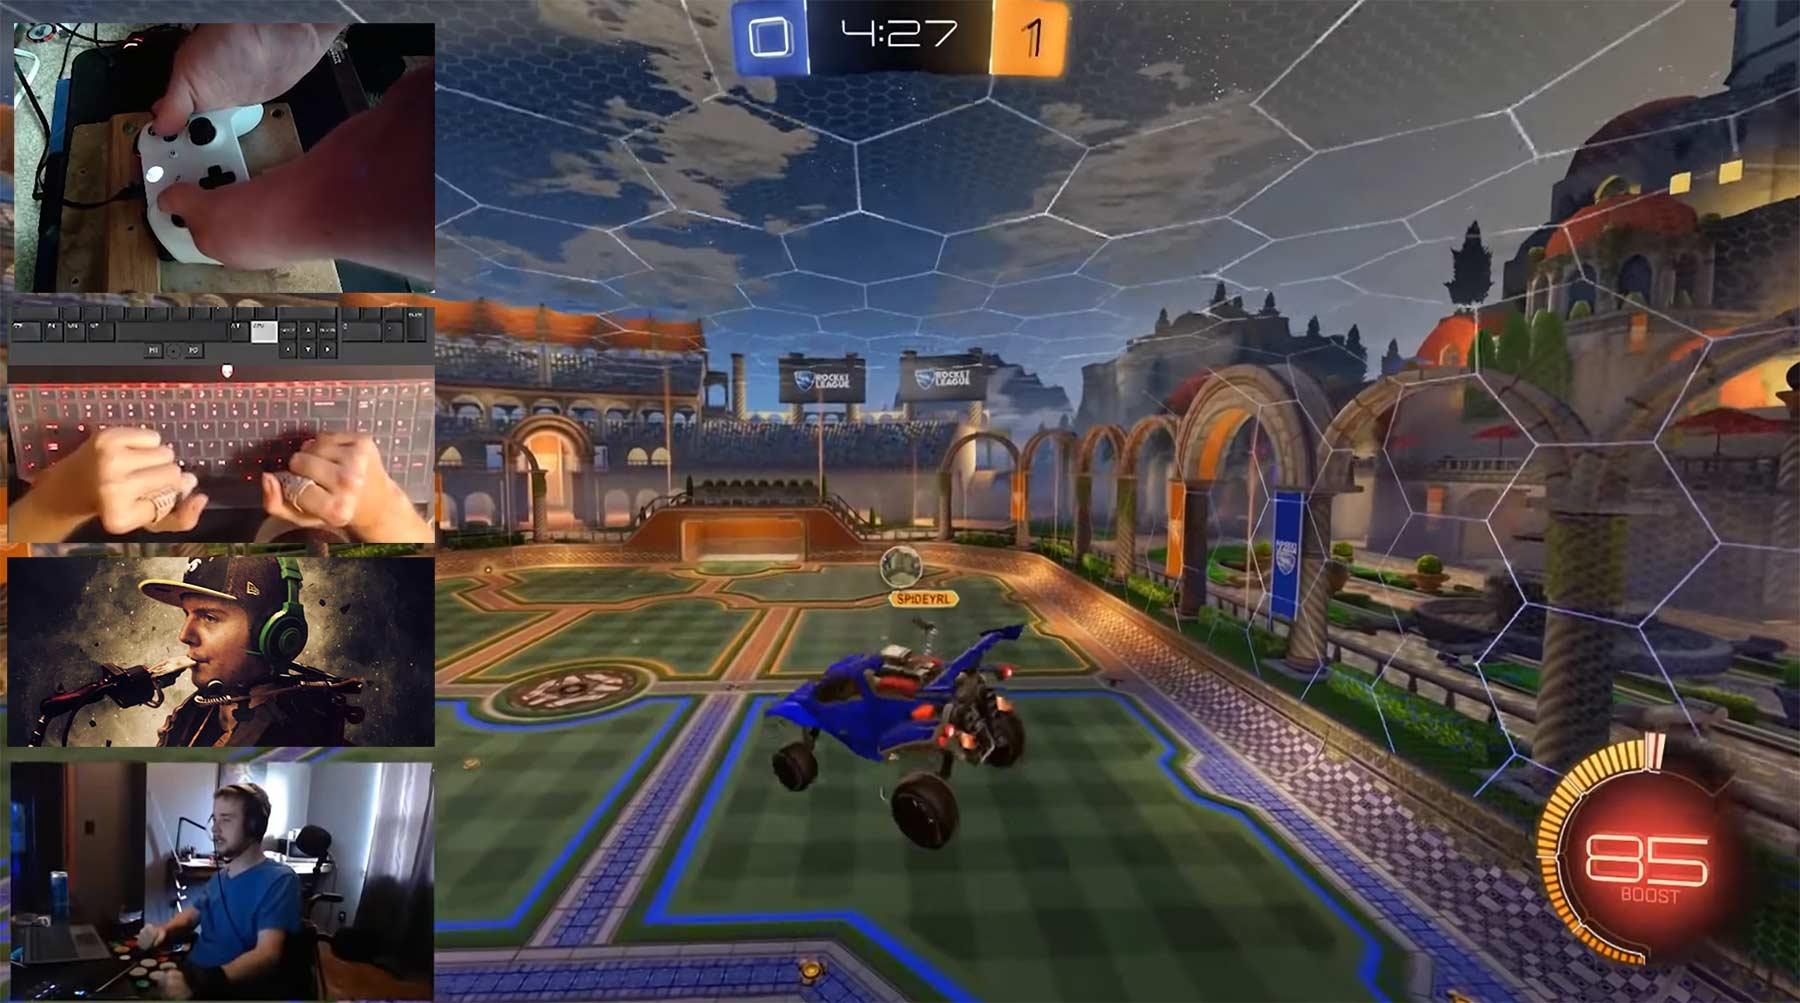 Rocket League: 4 Behinderte gegen 2 Champions